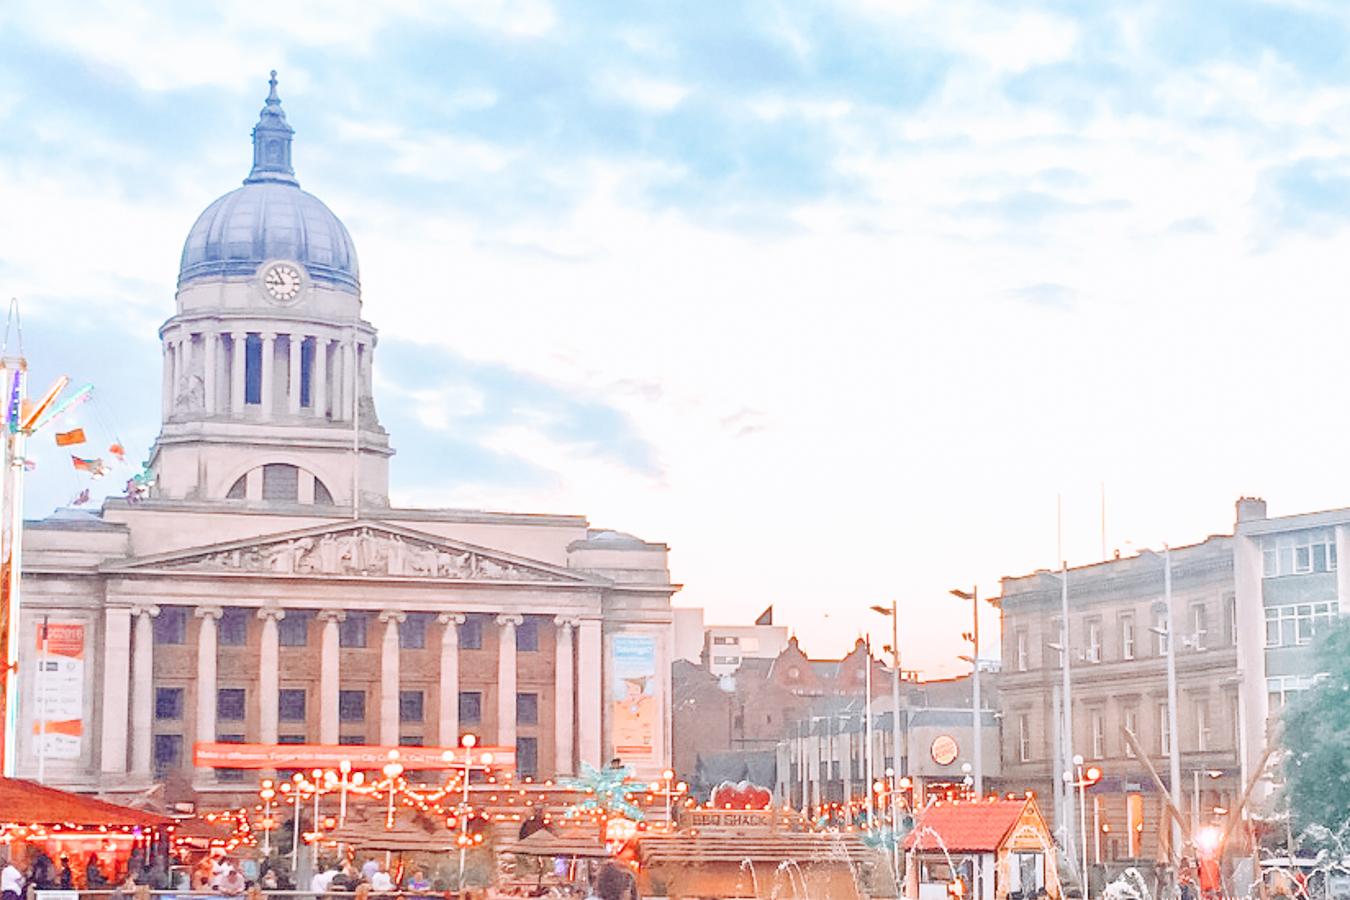 Building in Nottingham